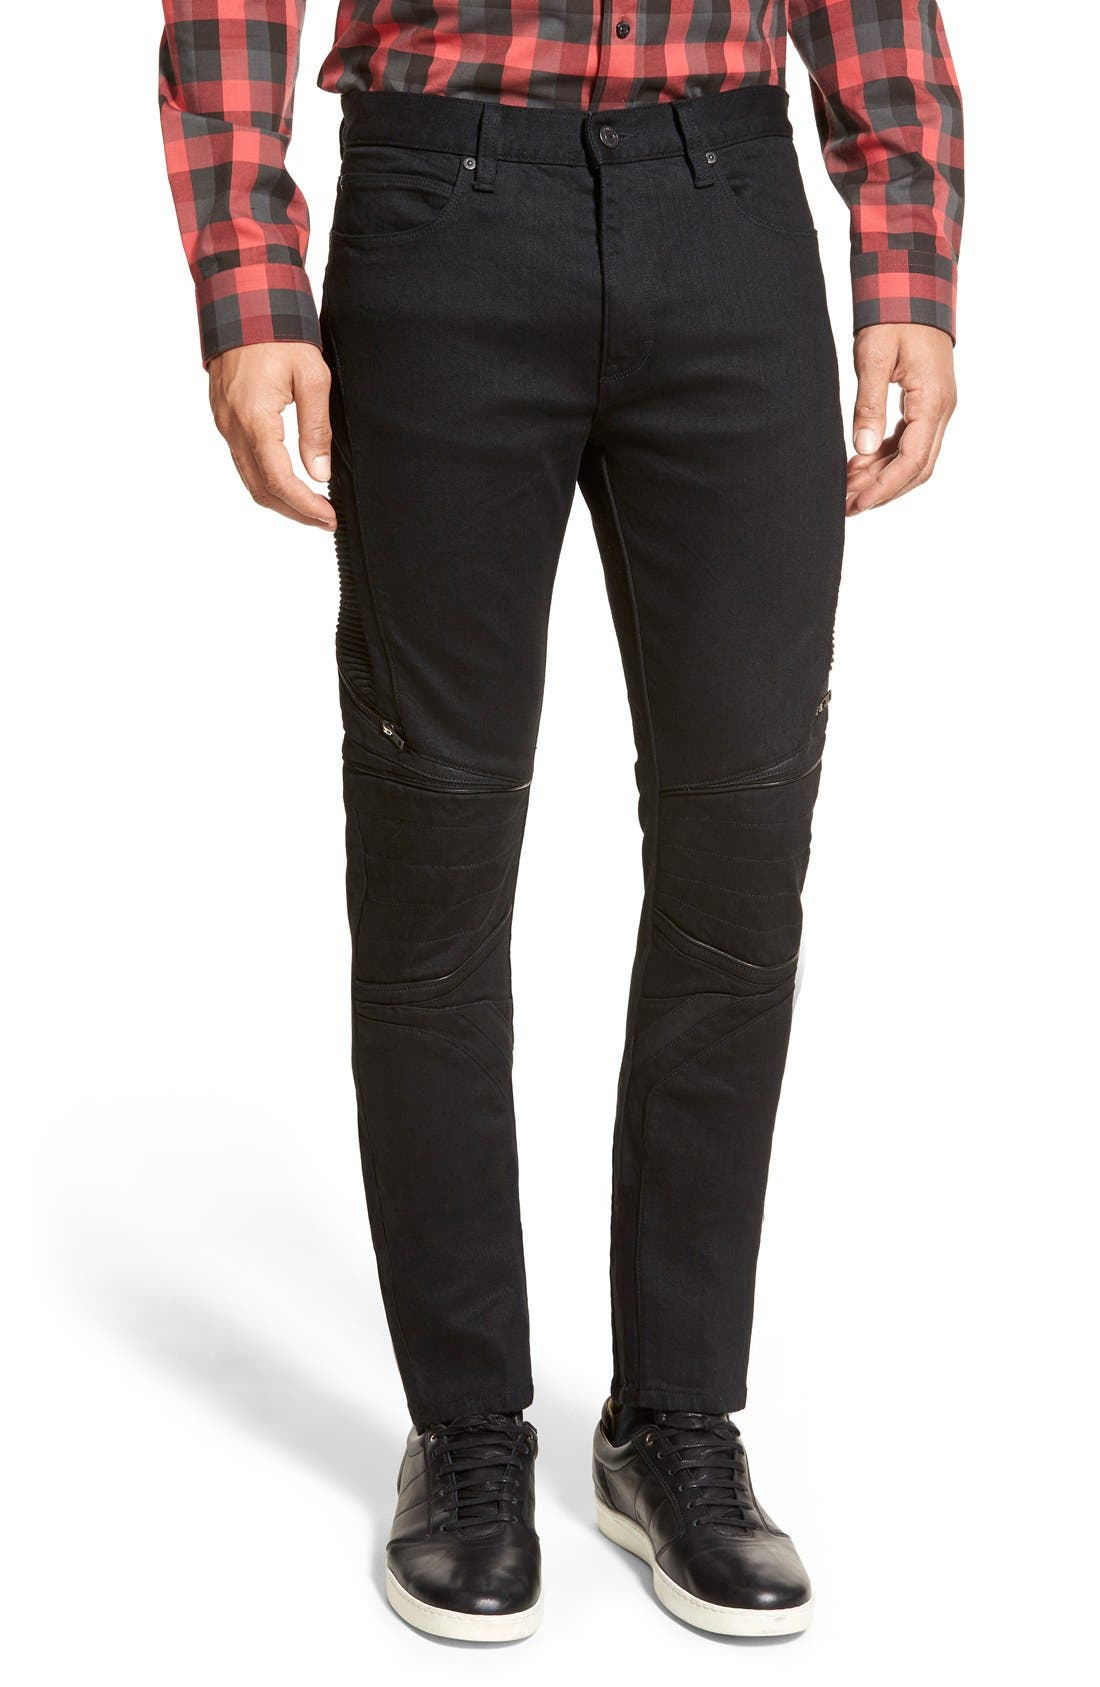 ZZDNUHUGO BOSS HUGO '734/24' Skinny Fit Moto Jeans, Main, color, 001